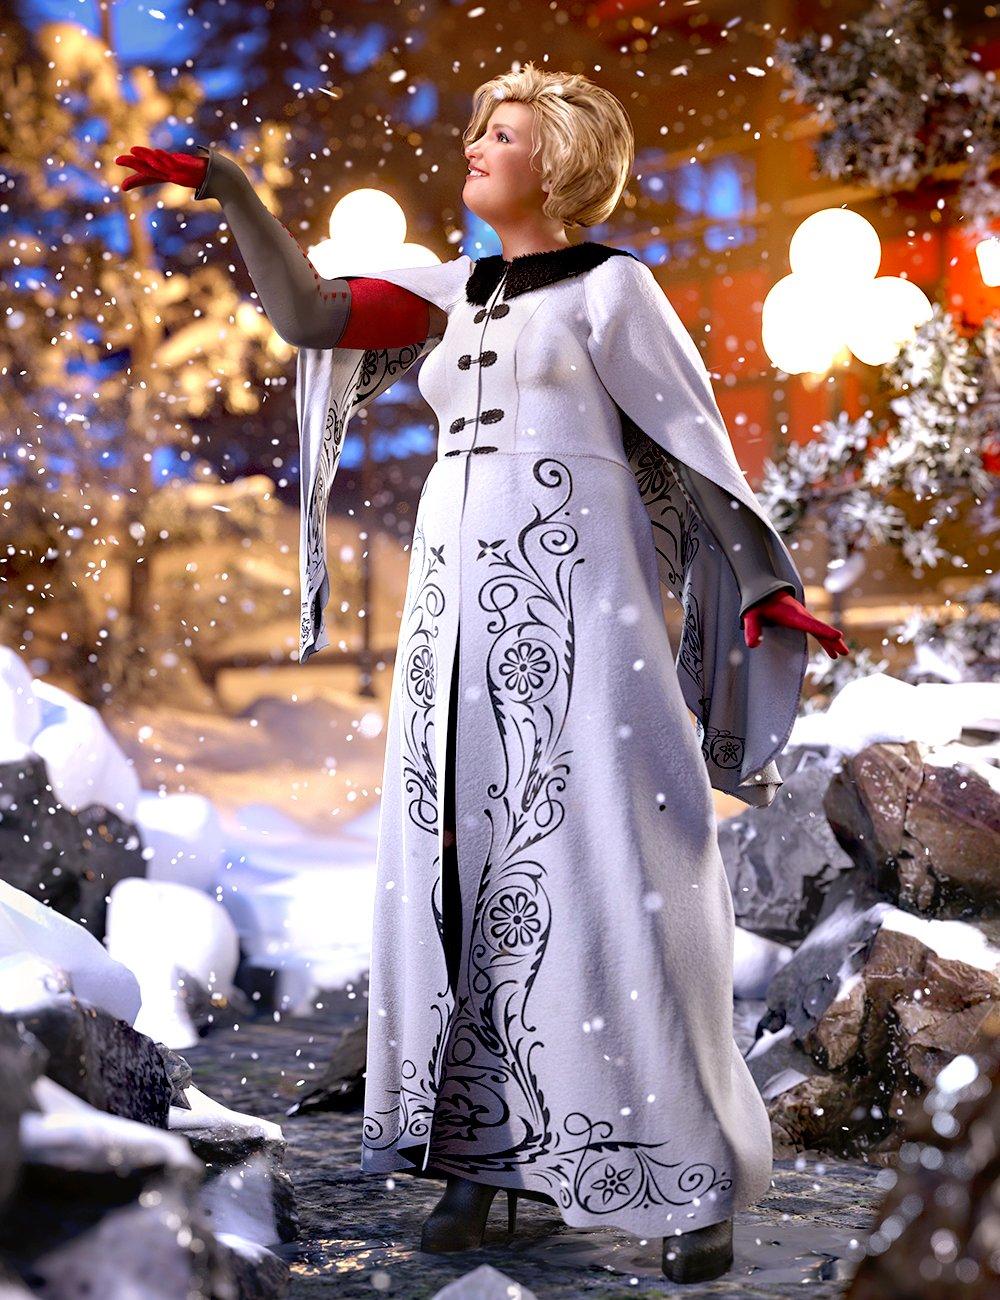 dForce Winter Splendor Outfit for Genesis 8 Females by: Barbara BrundonUmblefuglySadeMoonscape Graphics, 3D Models by Daz 3D